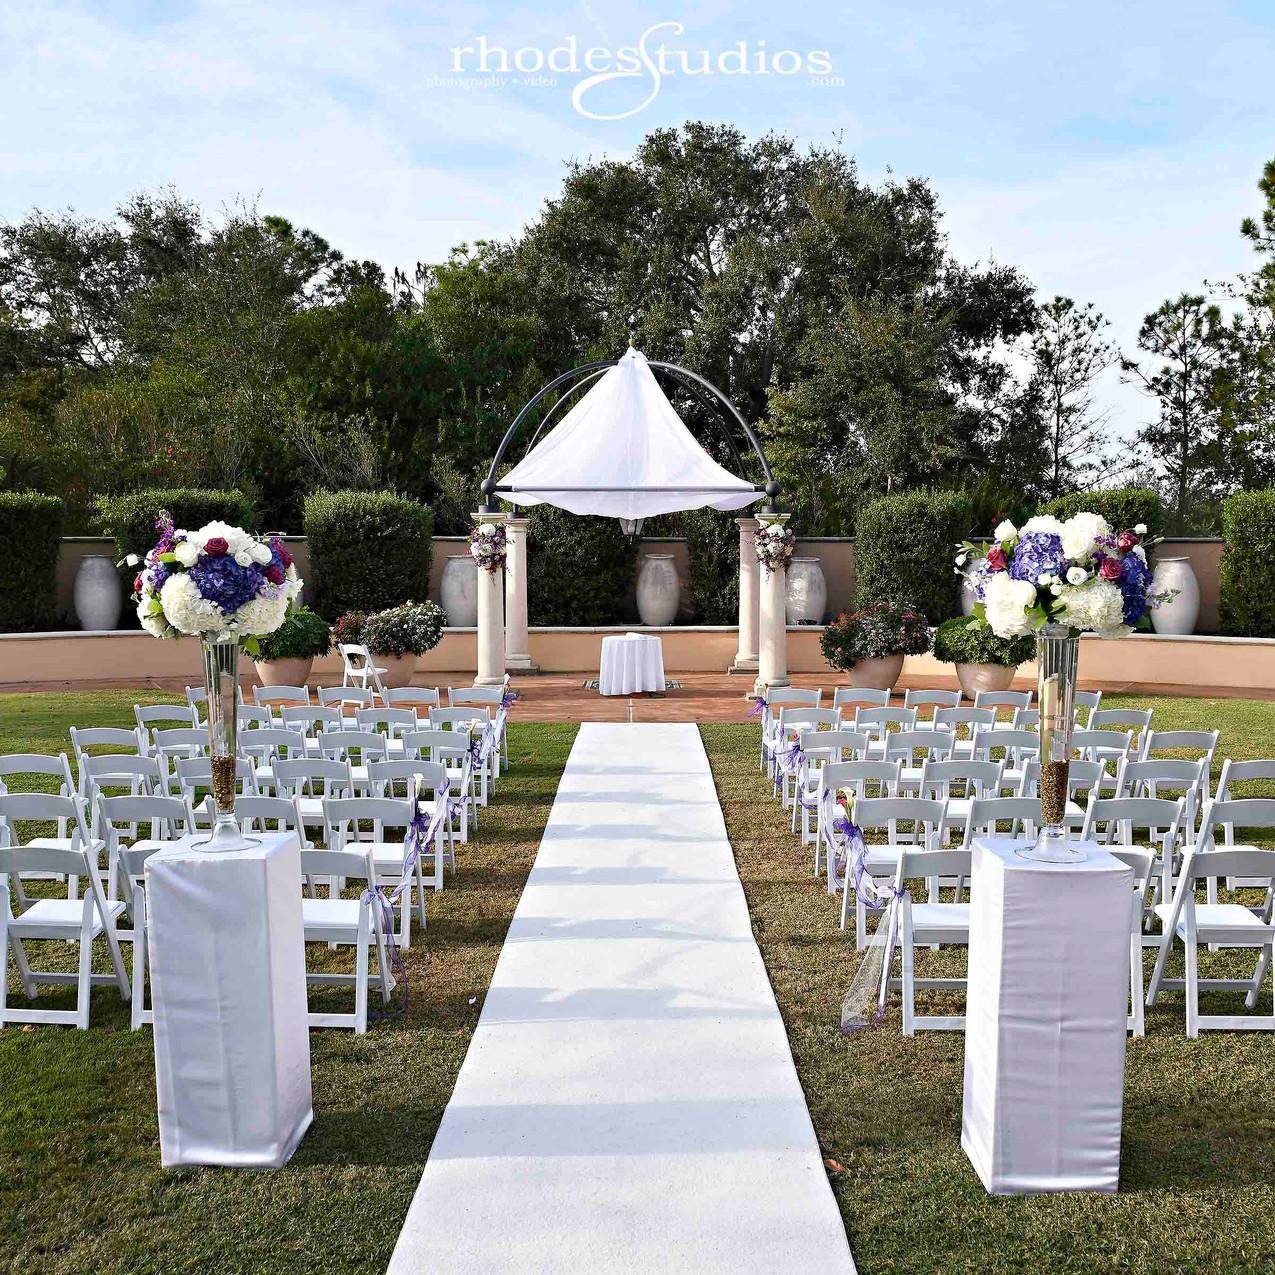 Beautiful ceremony site